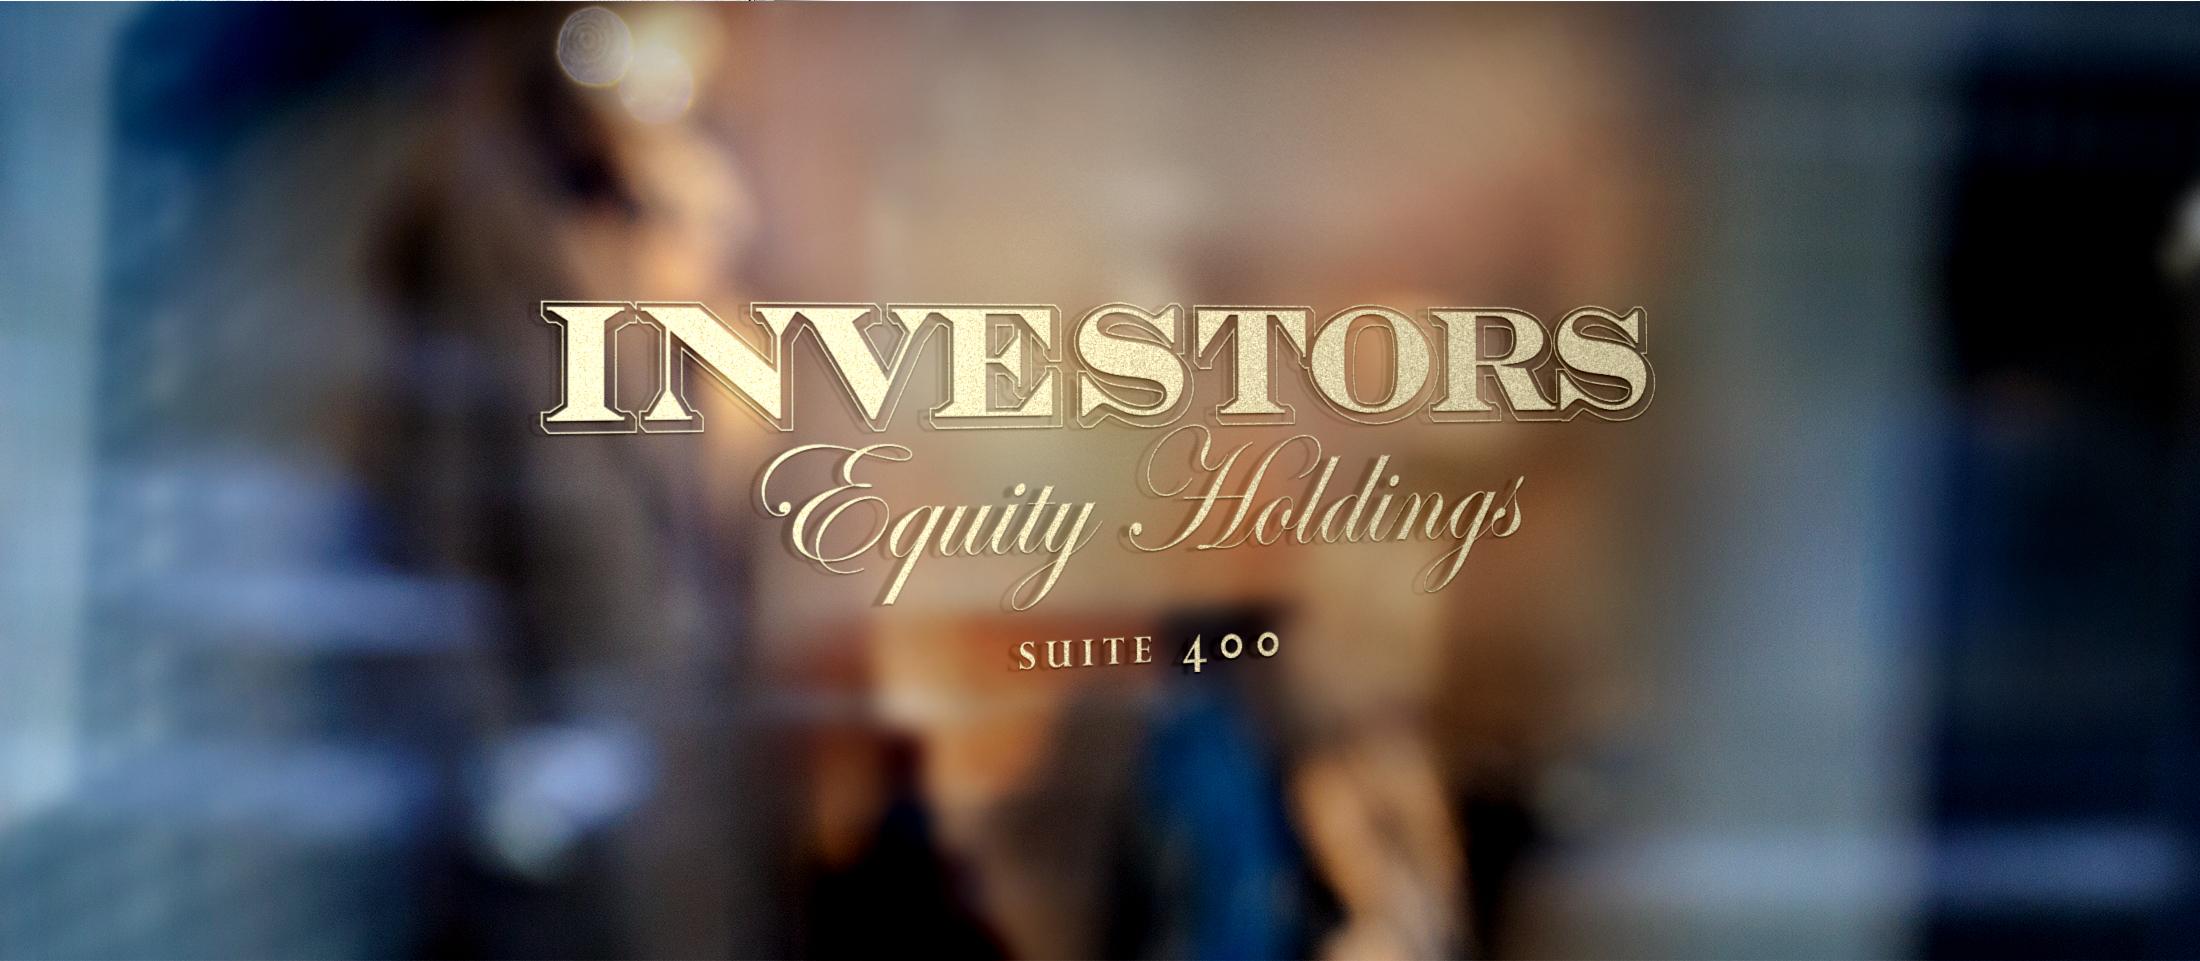 Investors Equity Signage © Robertson Design